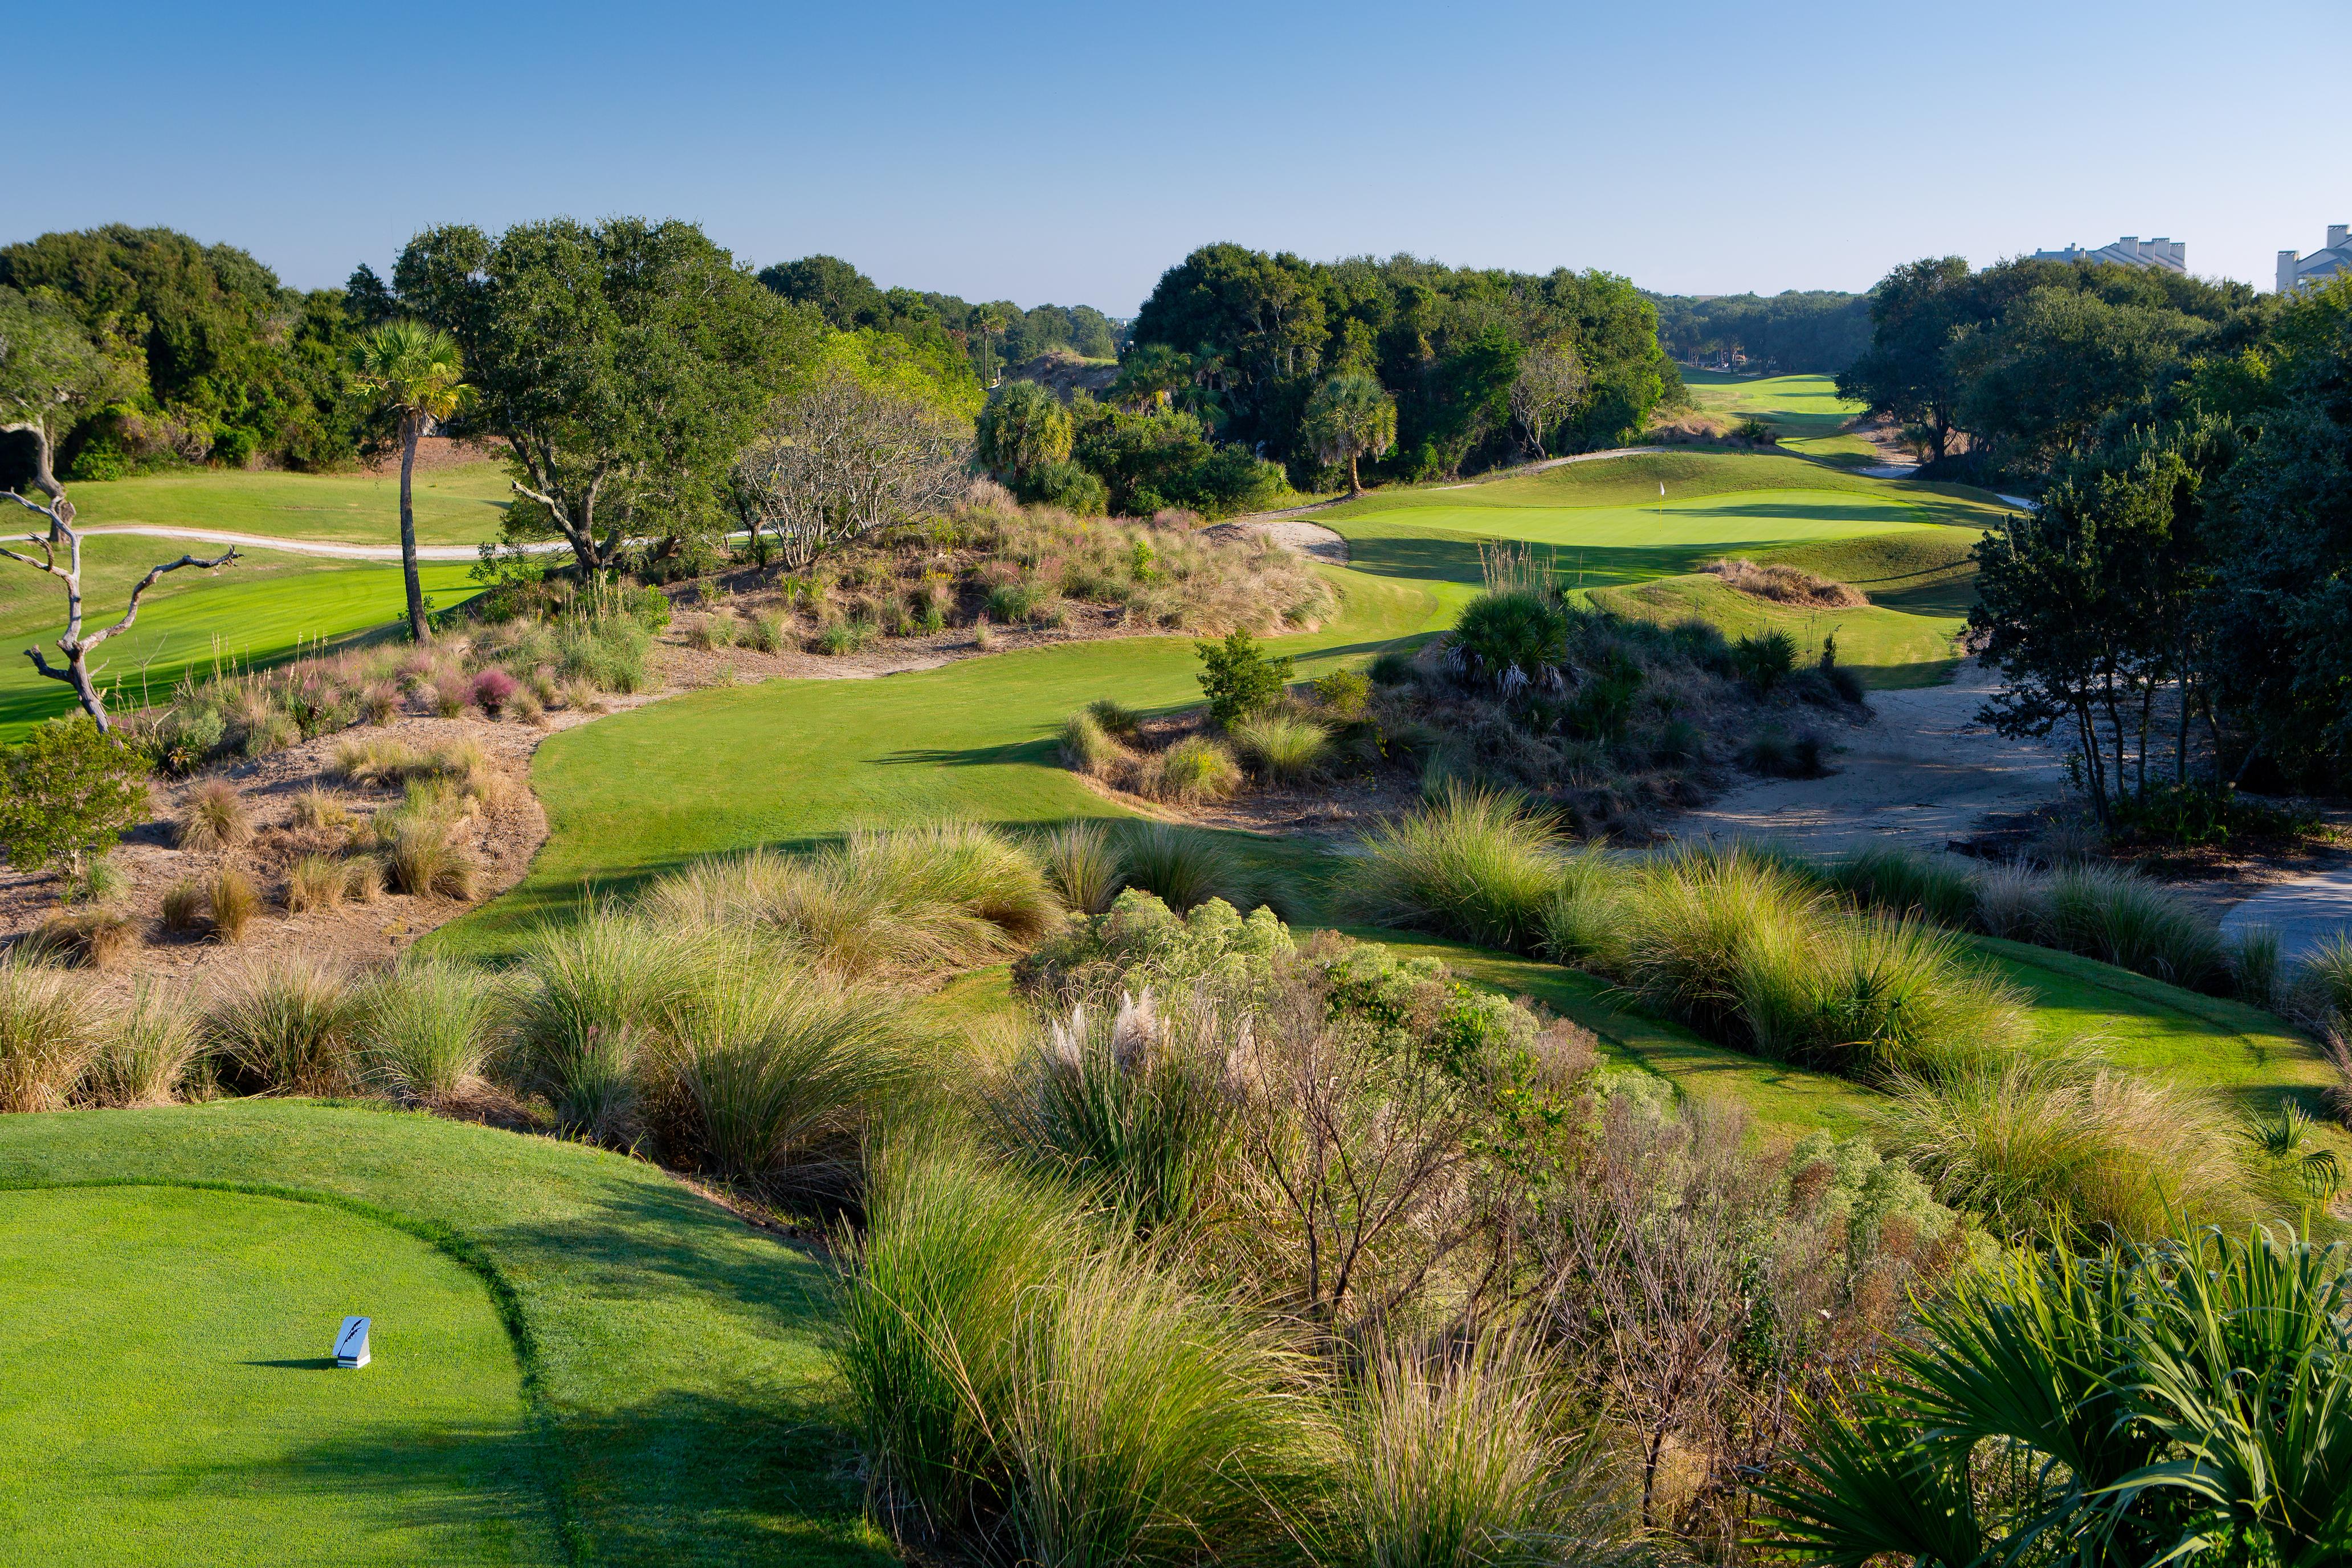 Wild Dunes Resort: Charleston's golf paradise on the Isle of Palms